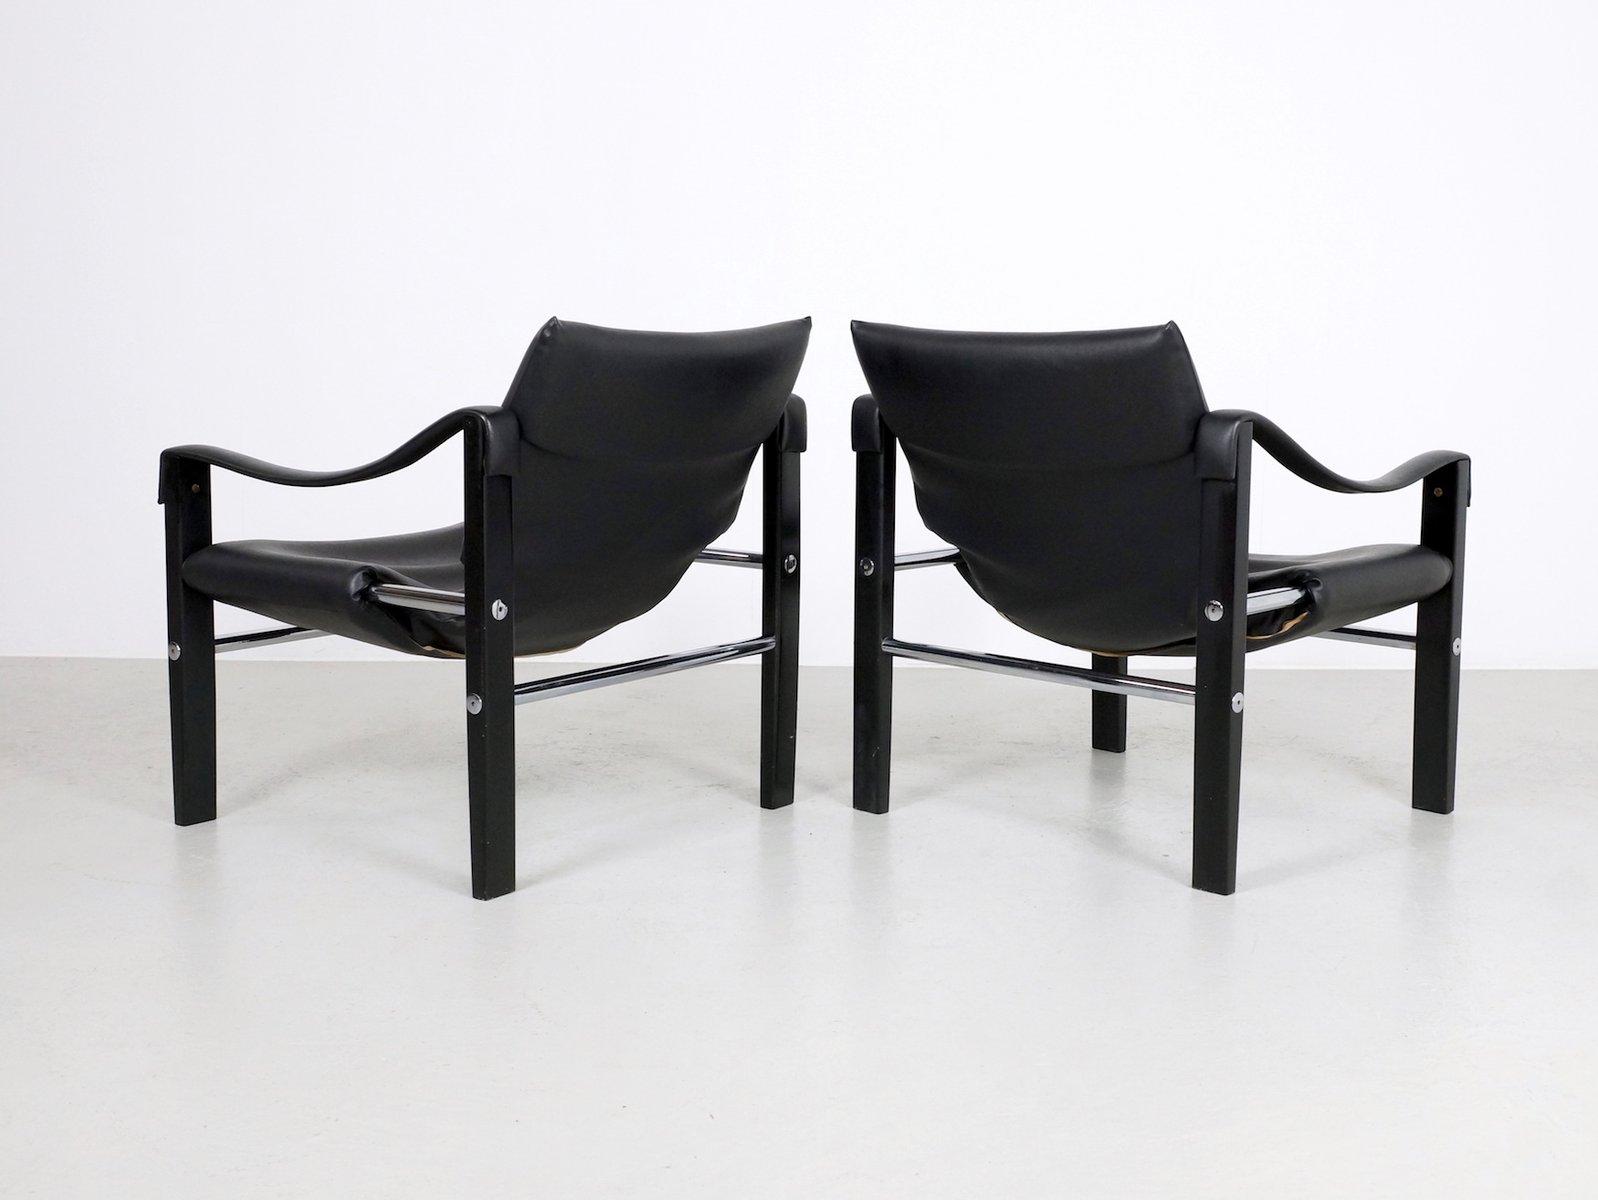 schwarze chelsea st hle von maurice burke f r arkana 2er set bei pamono kaufen. Black Bedroom Furniture Sets. Home Design Ideas